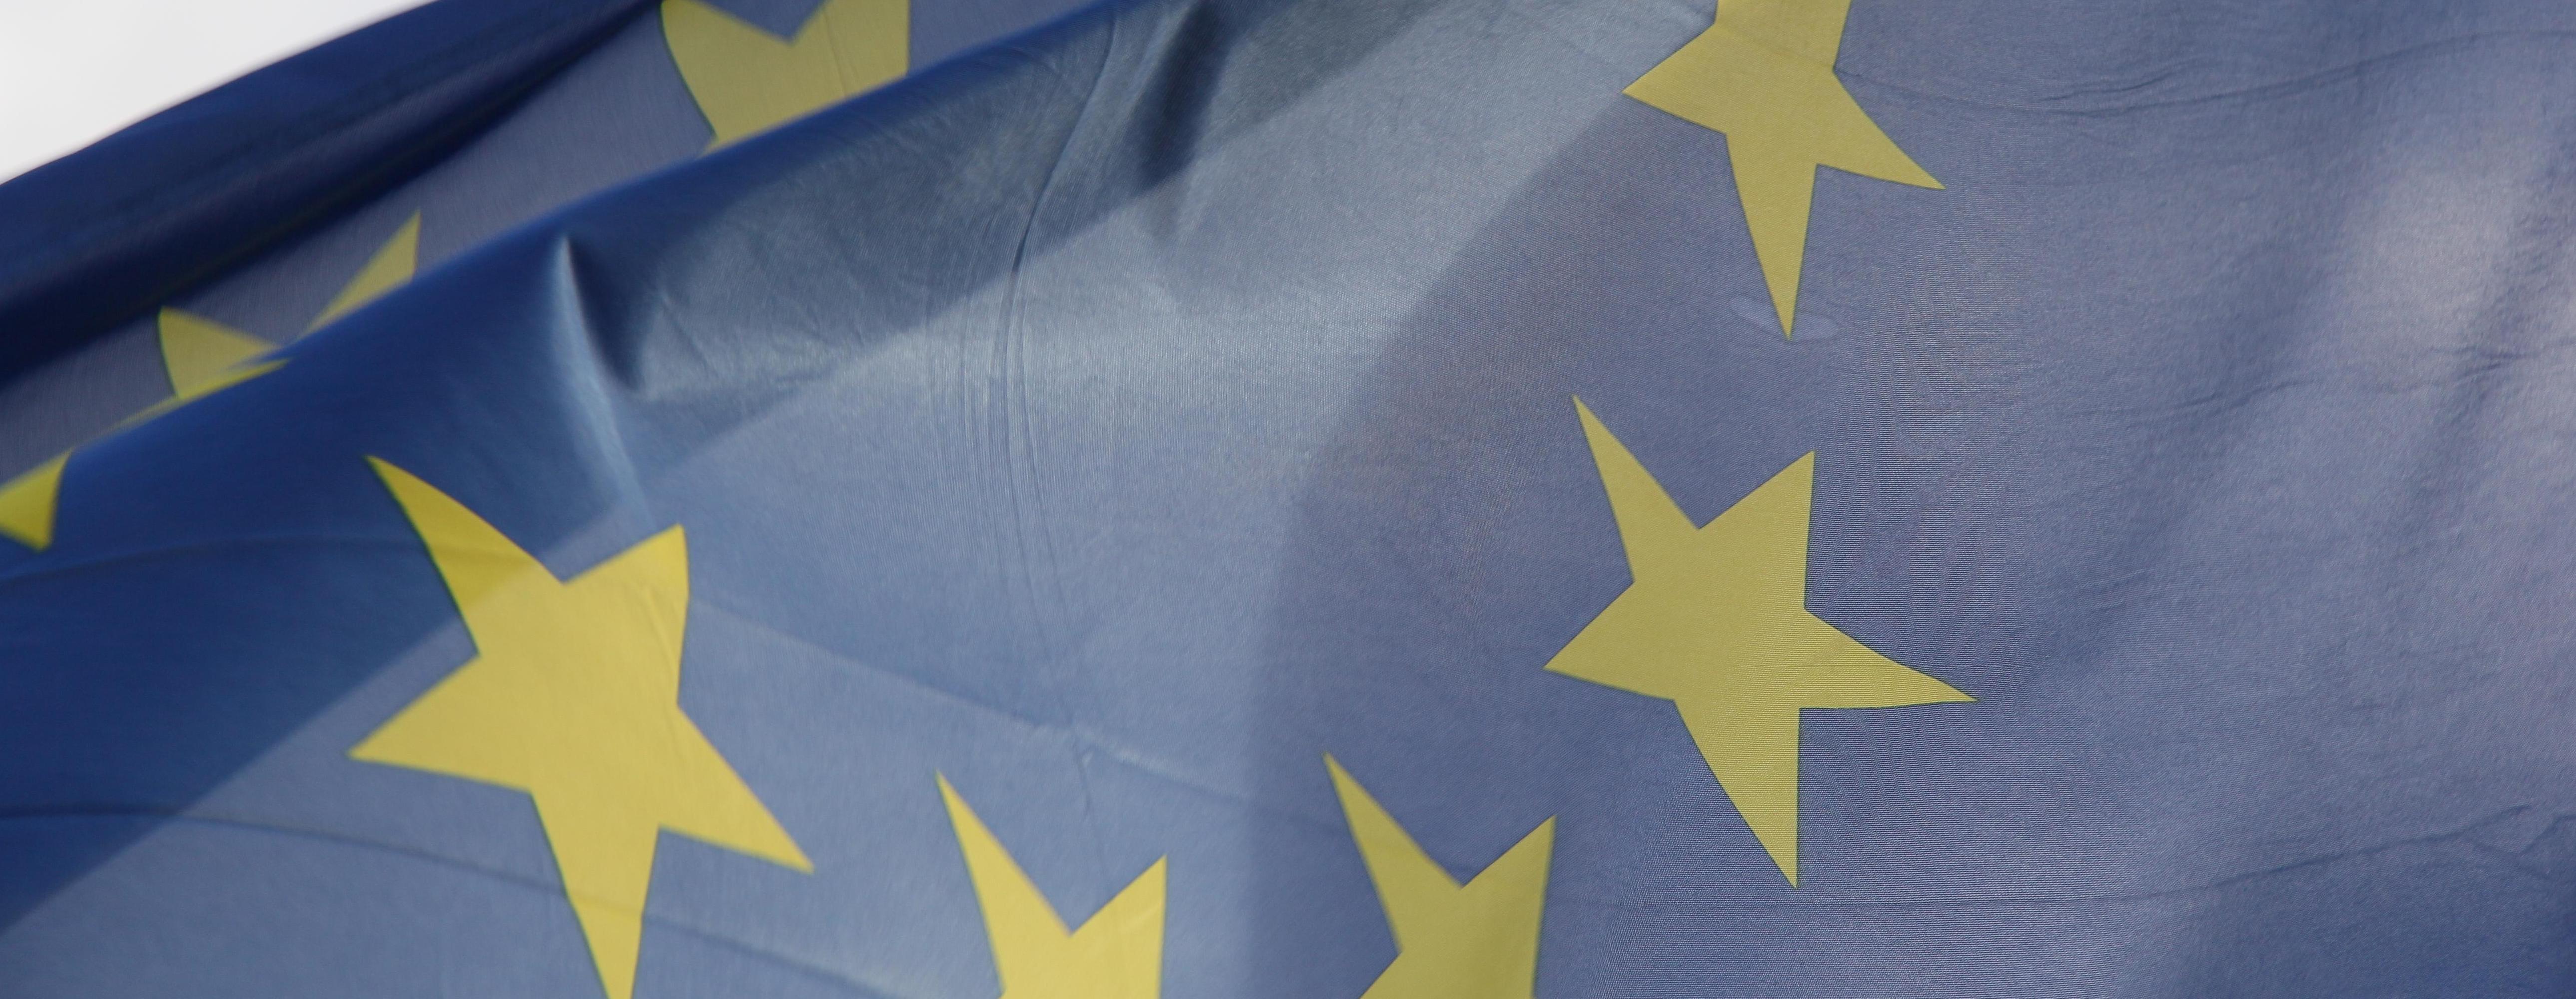 Uk Trade with the EU